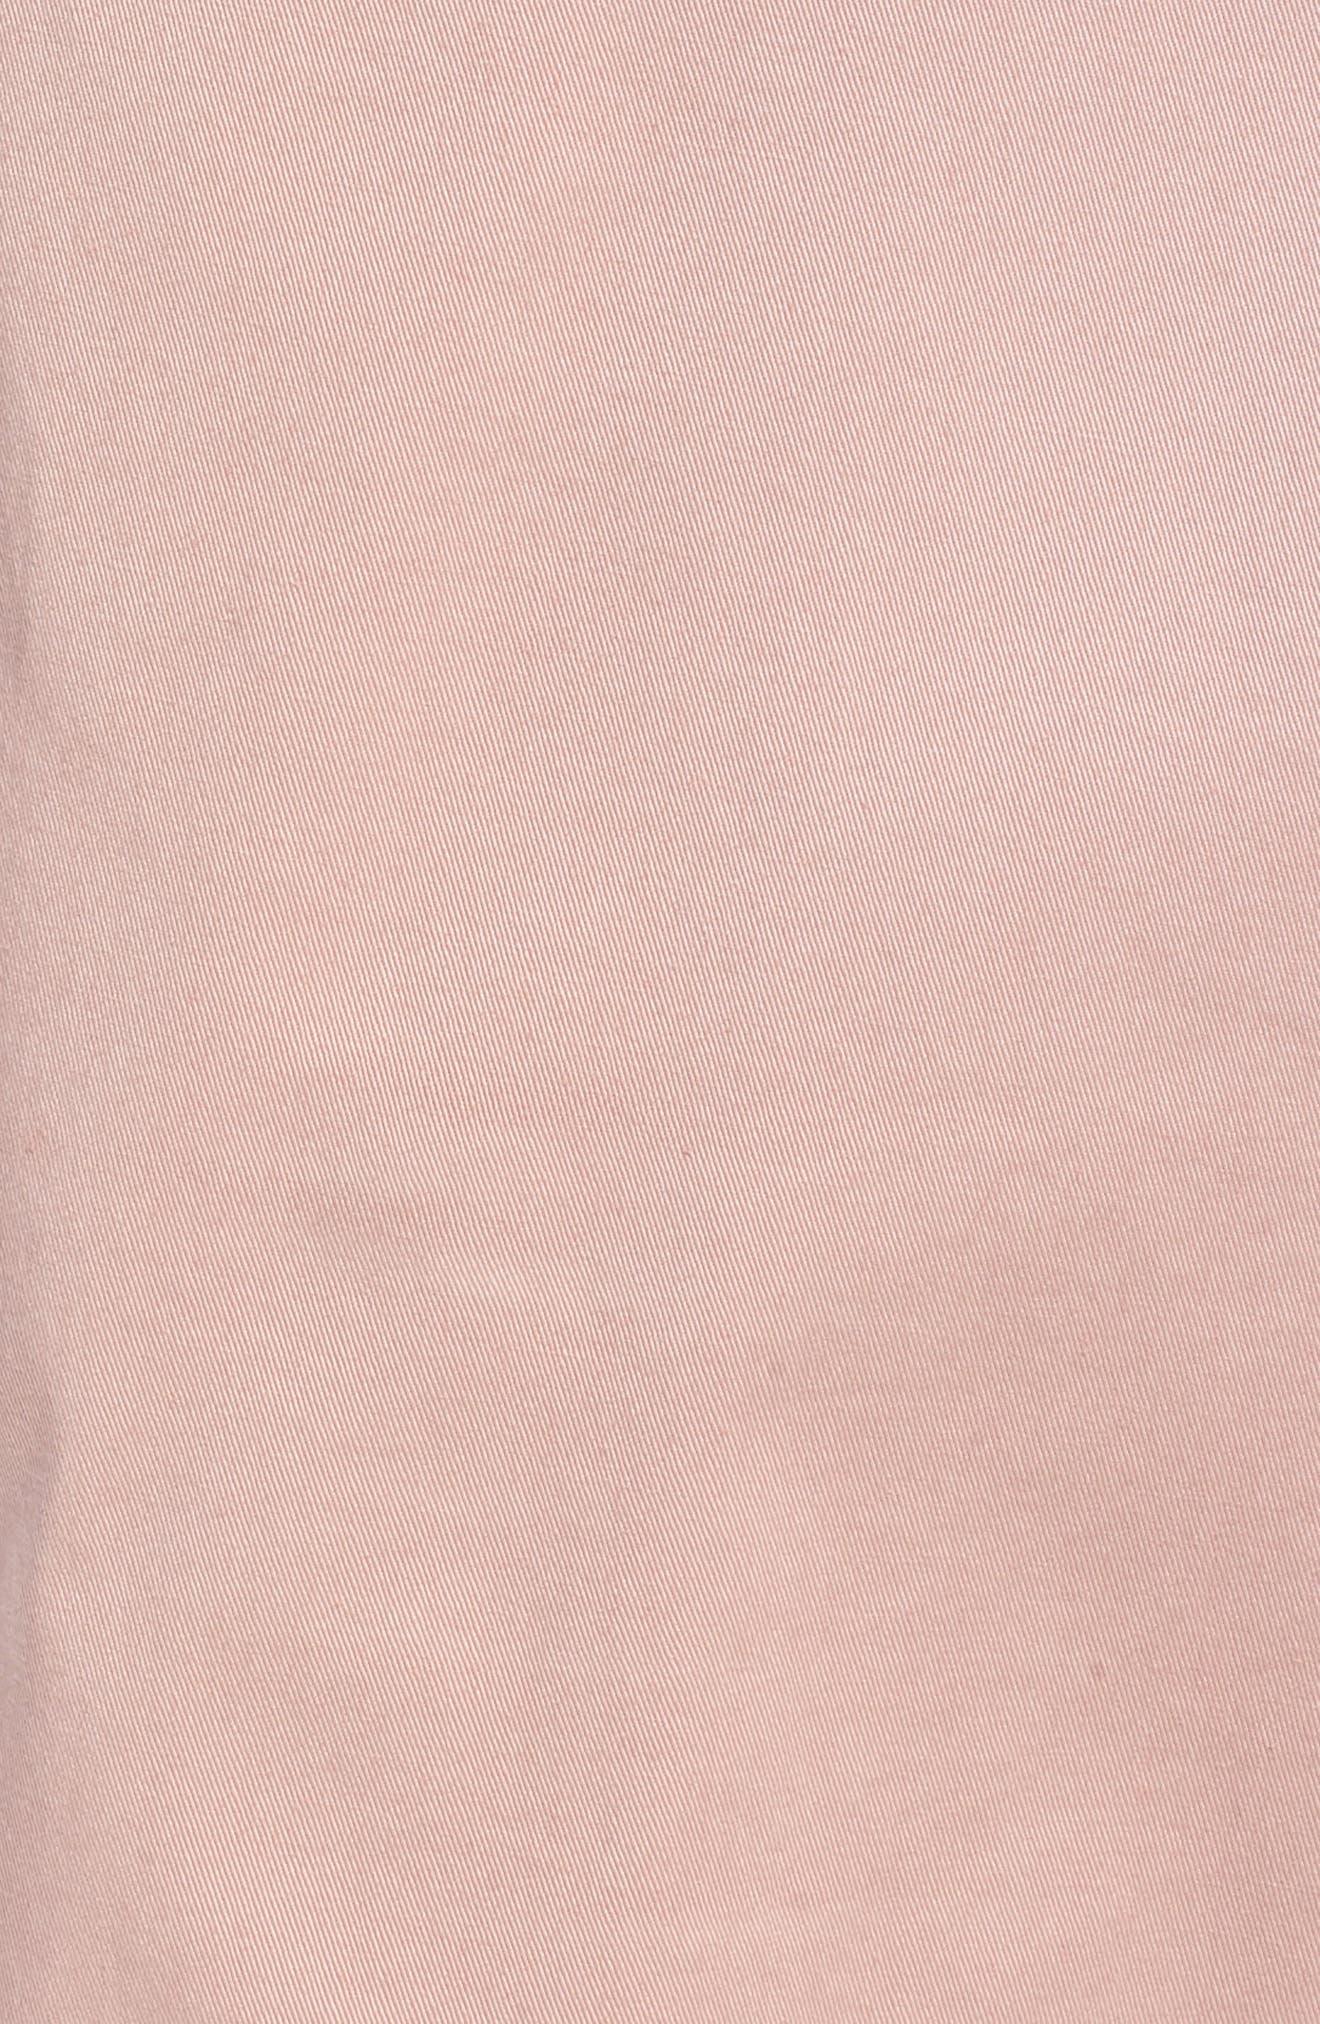 St. Barts Twill Shorts,                             Alternate thumbnail 59, color,